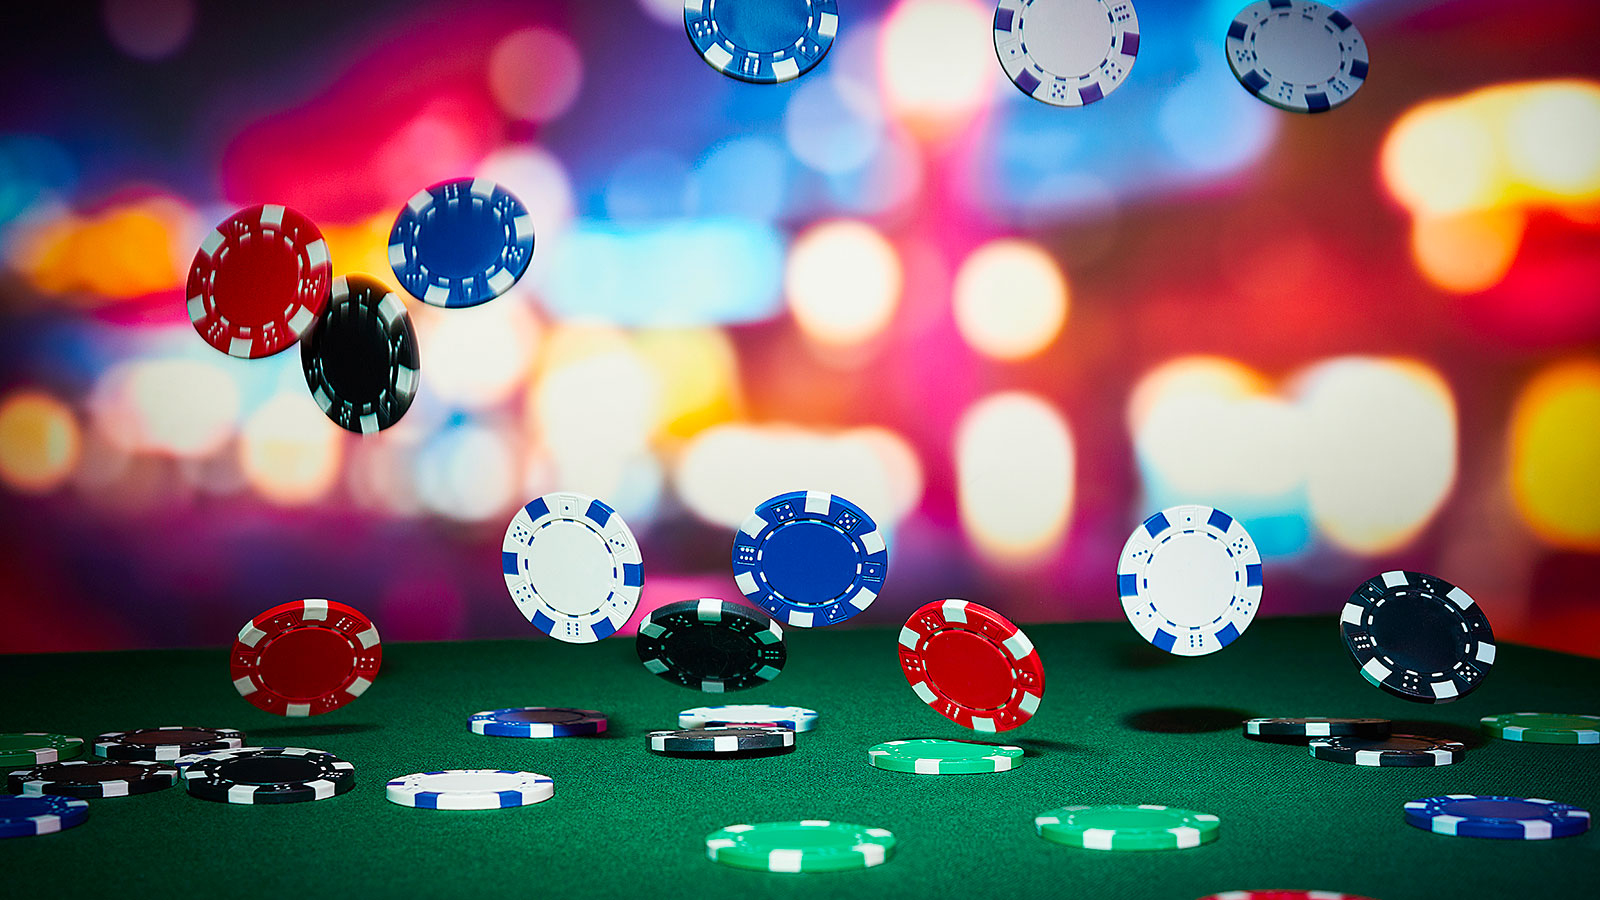 Nj gambling online